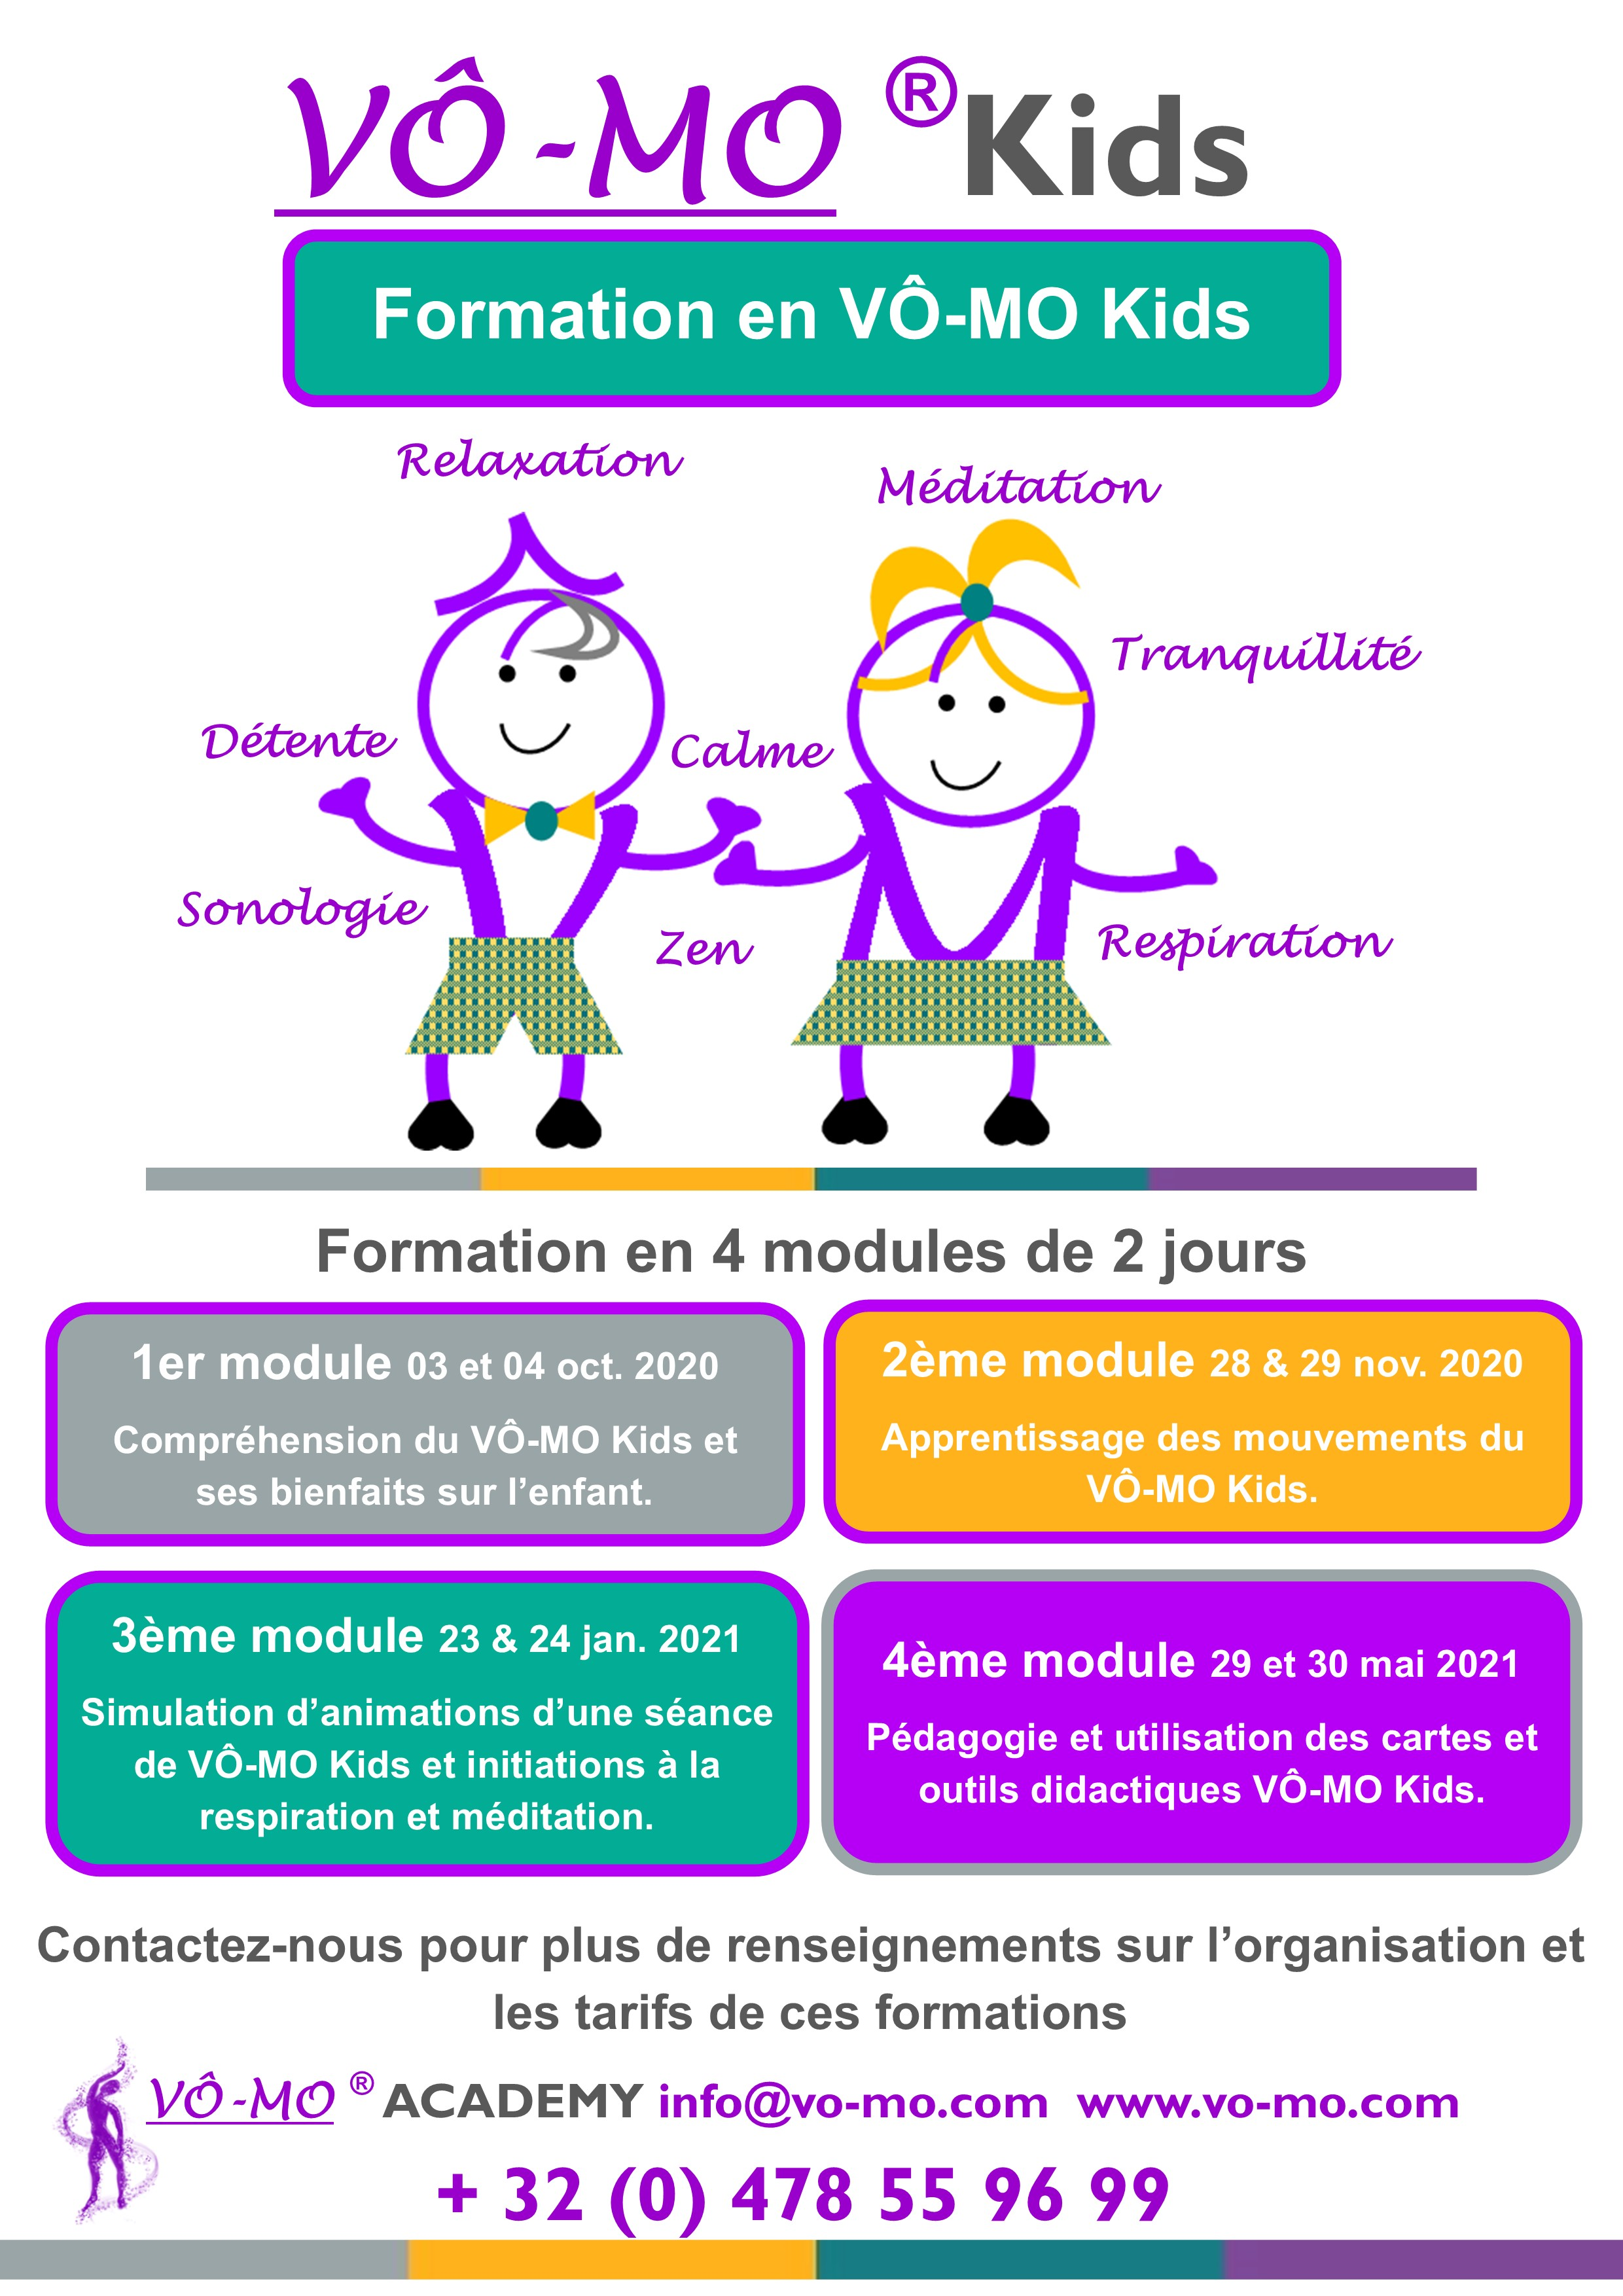 Formation en VÔ-MO Kids - module 4 @ VÔ-MO Academy